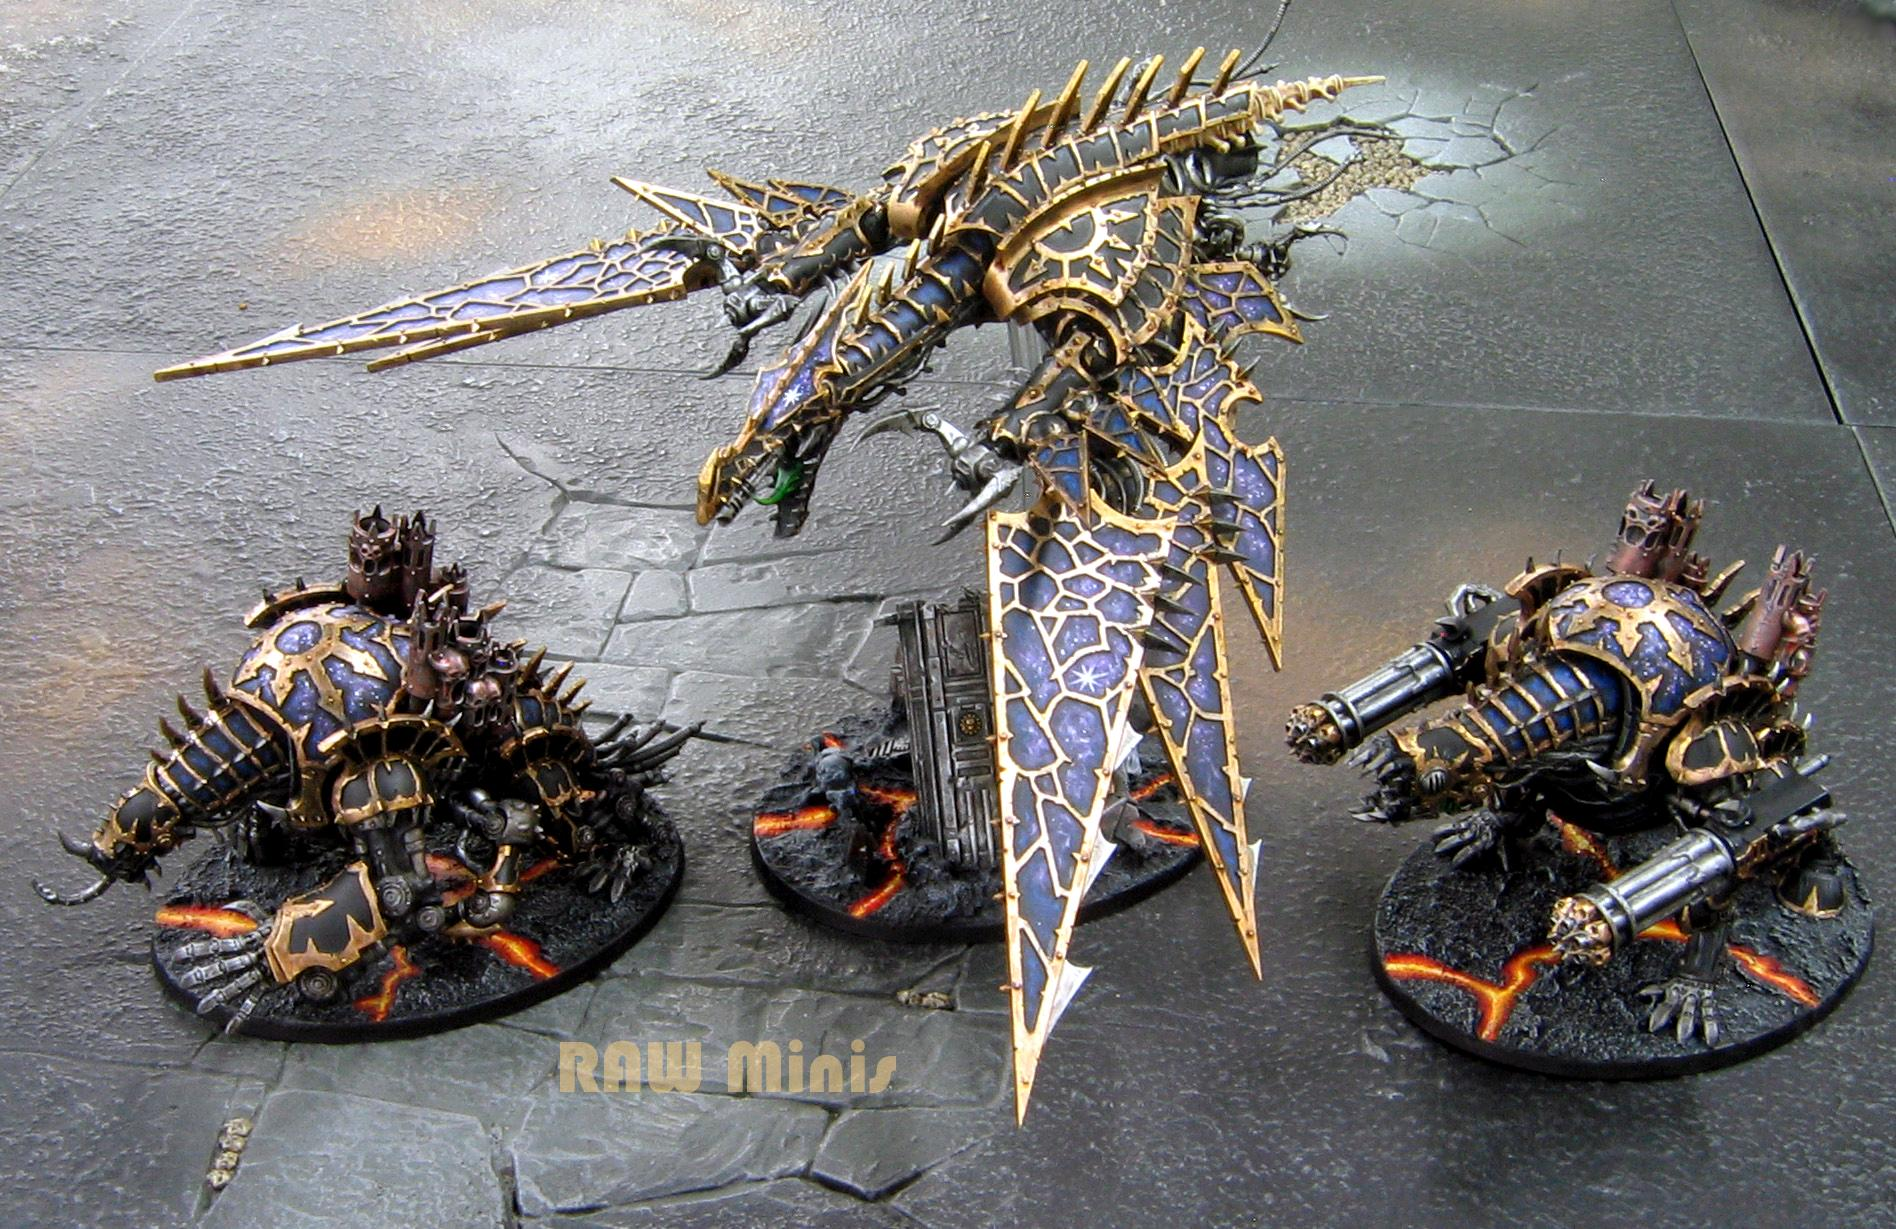 Chaos Daemons, Chaos Space Marines, Daemons, Painting, Vehicle, Warhammer 40,000